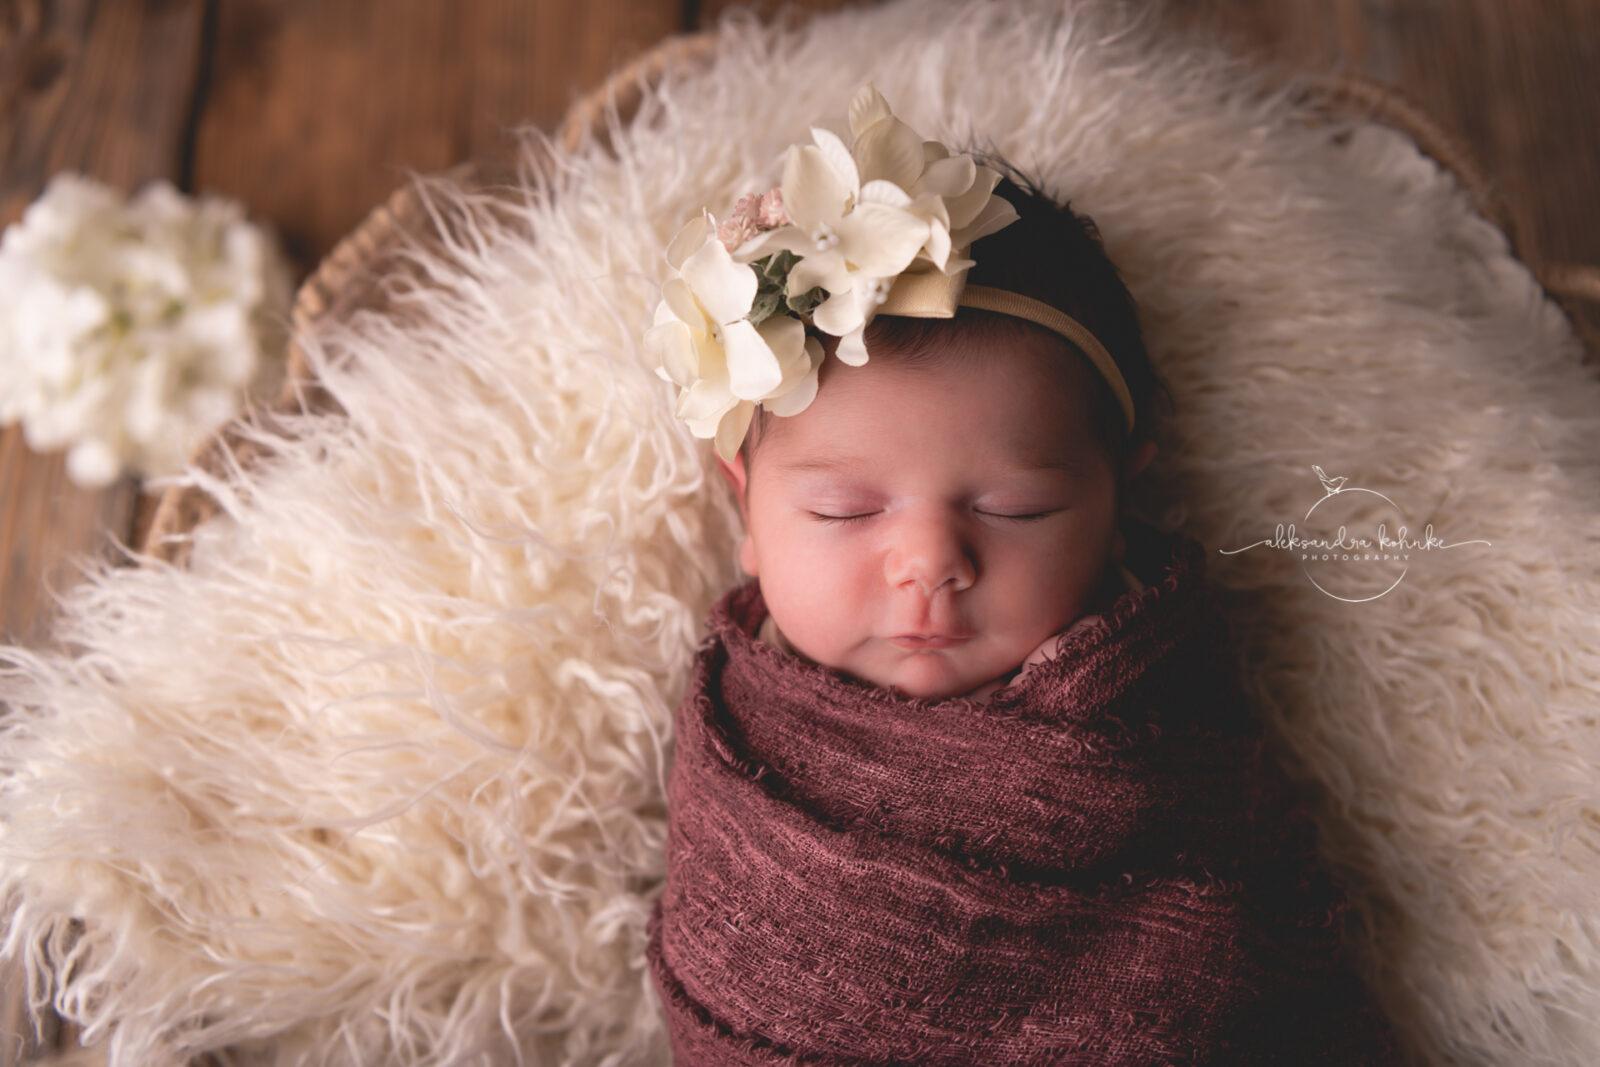 Neugeborenenfotograf in Rapperswil Jona und Umgebung